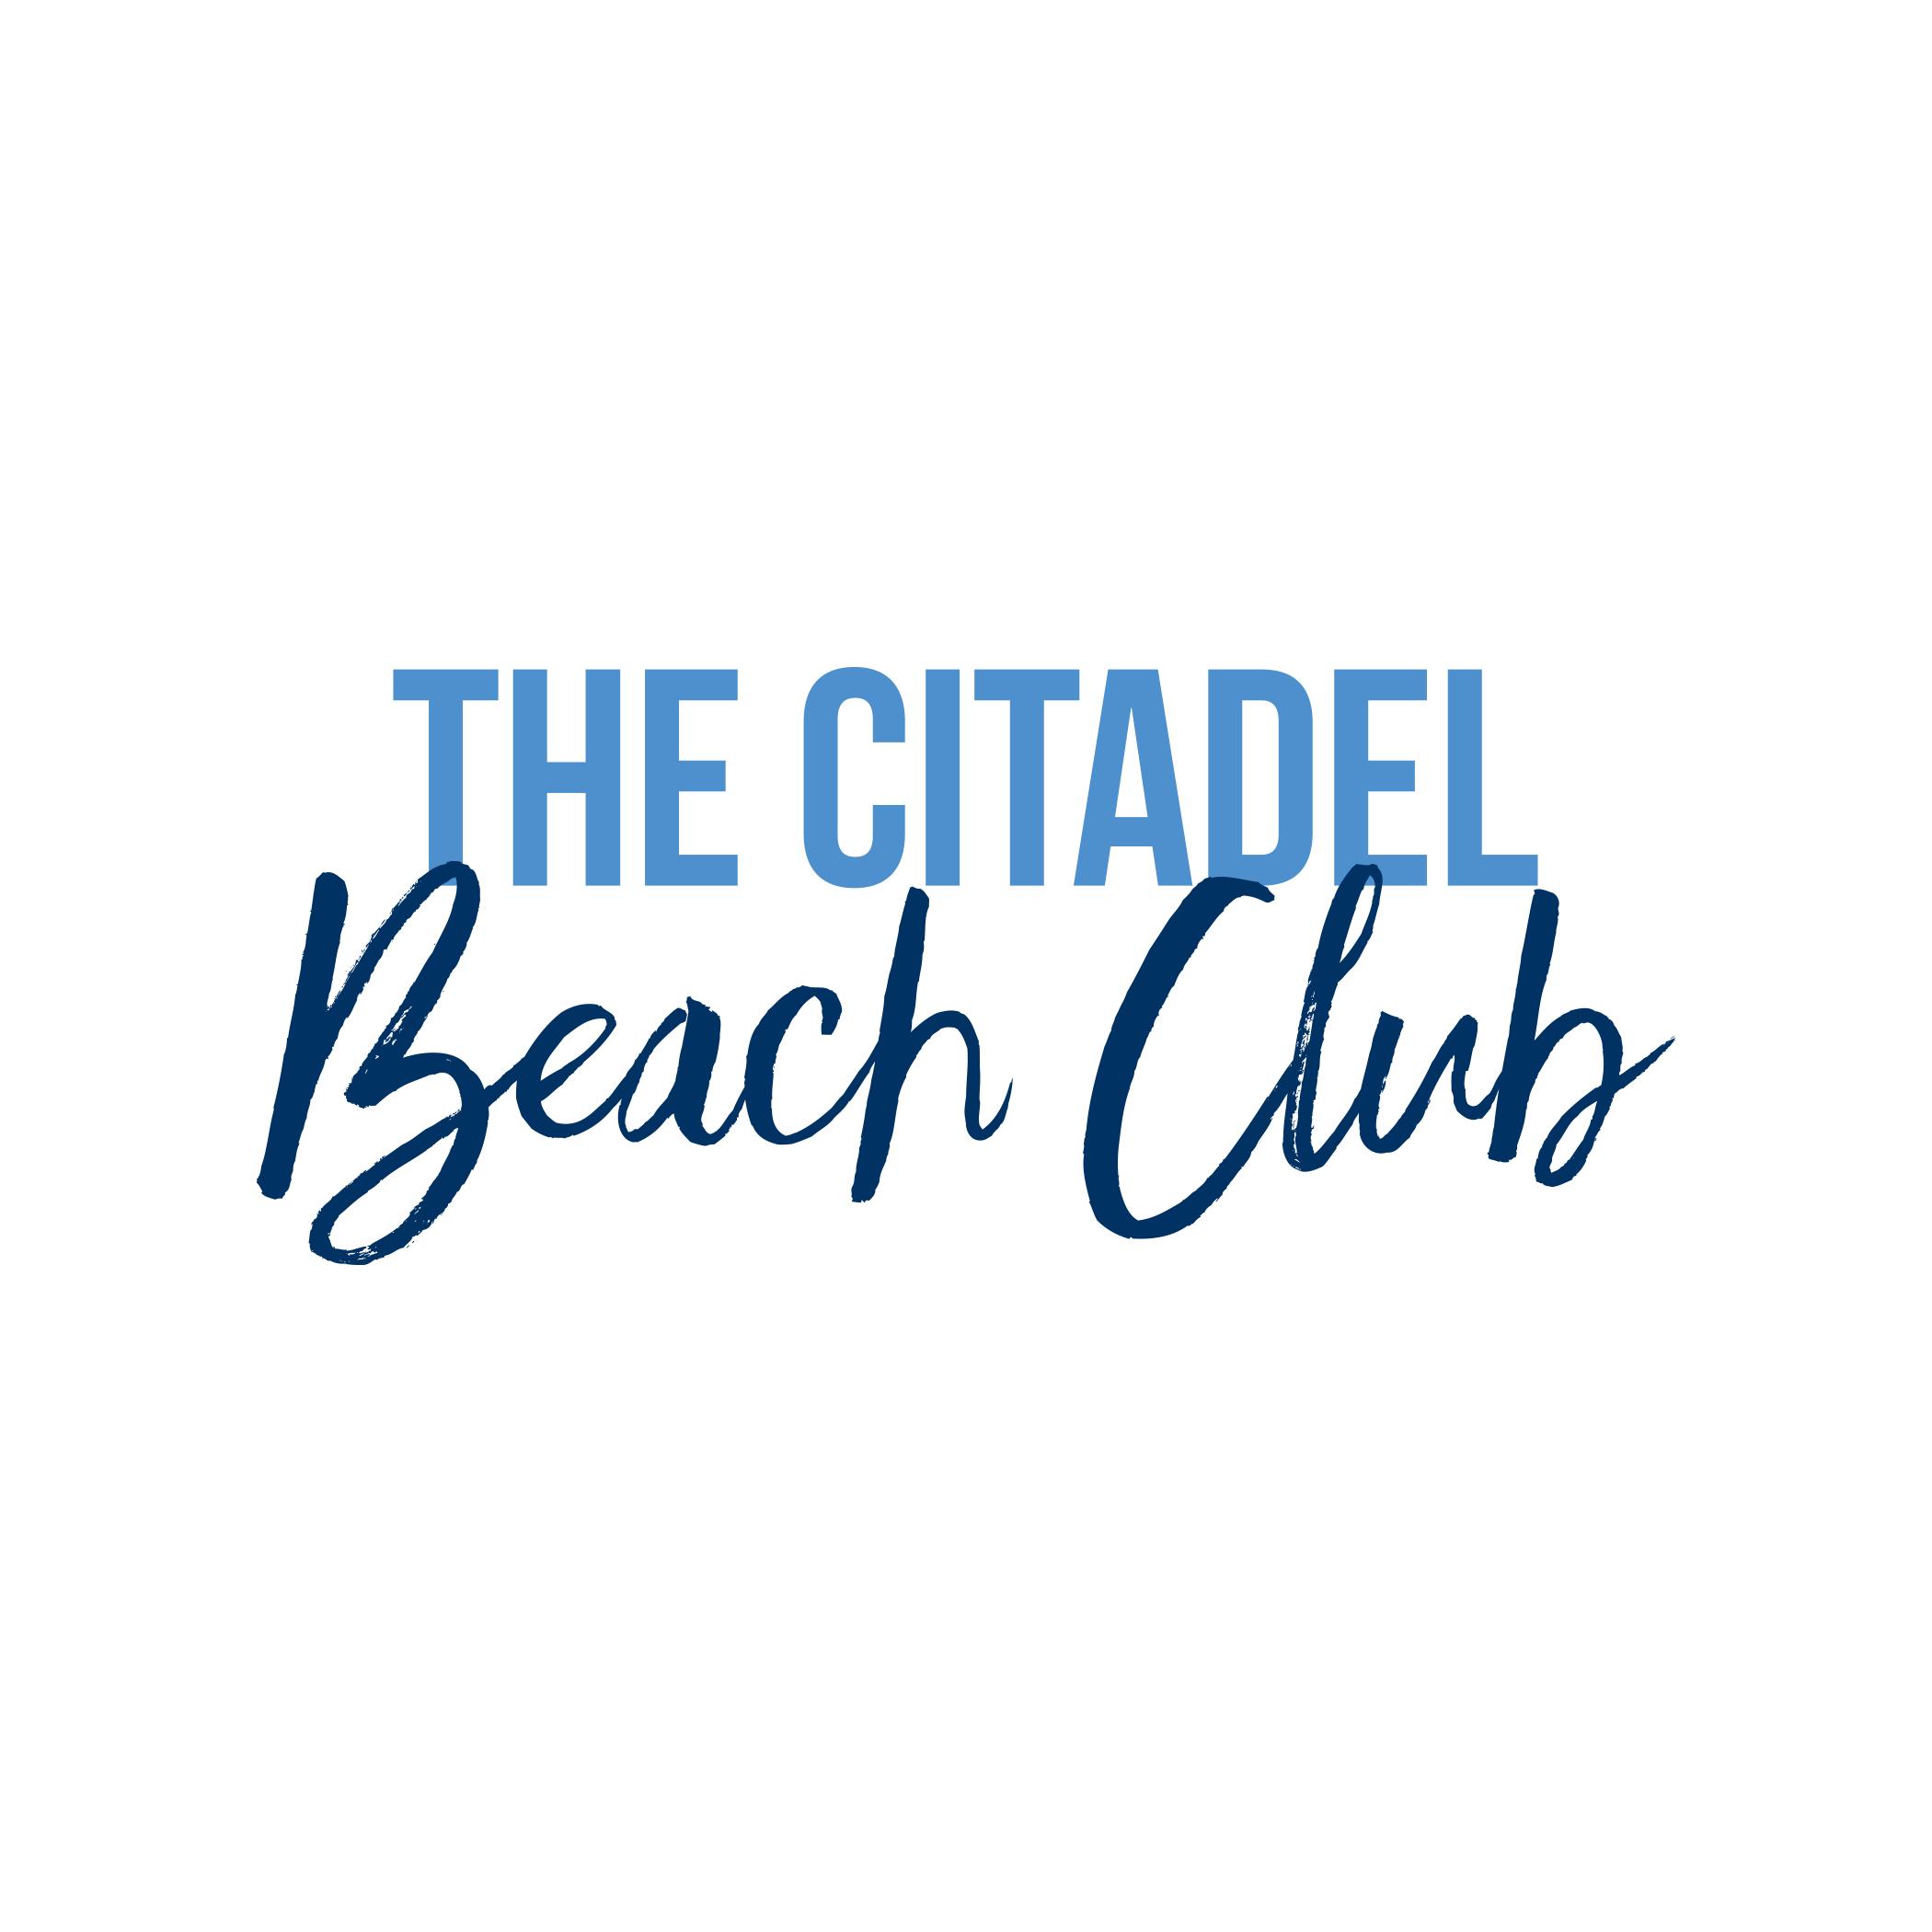 The Citadel Beach Club